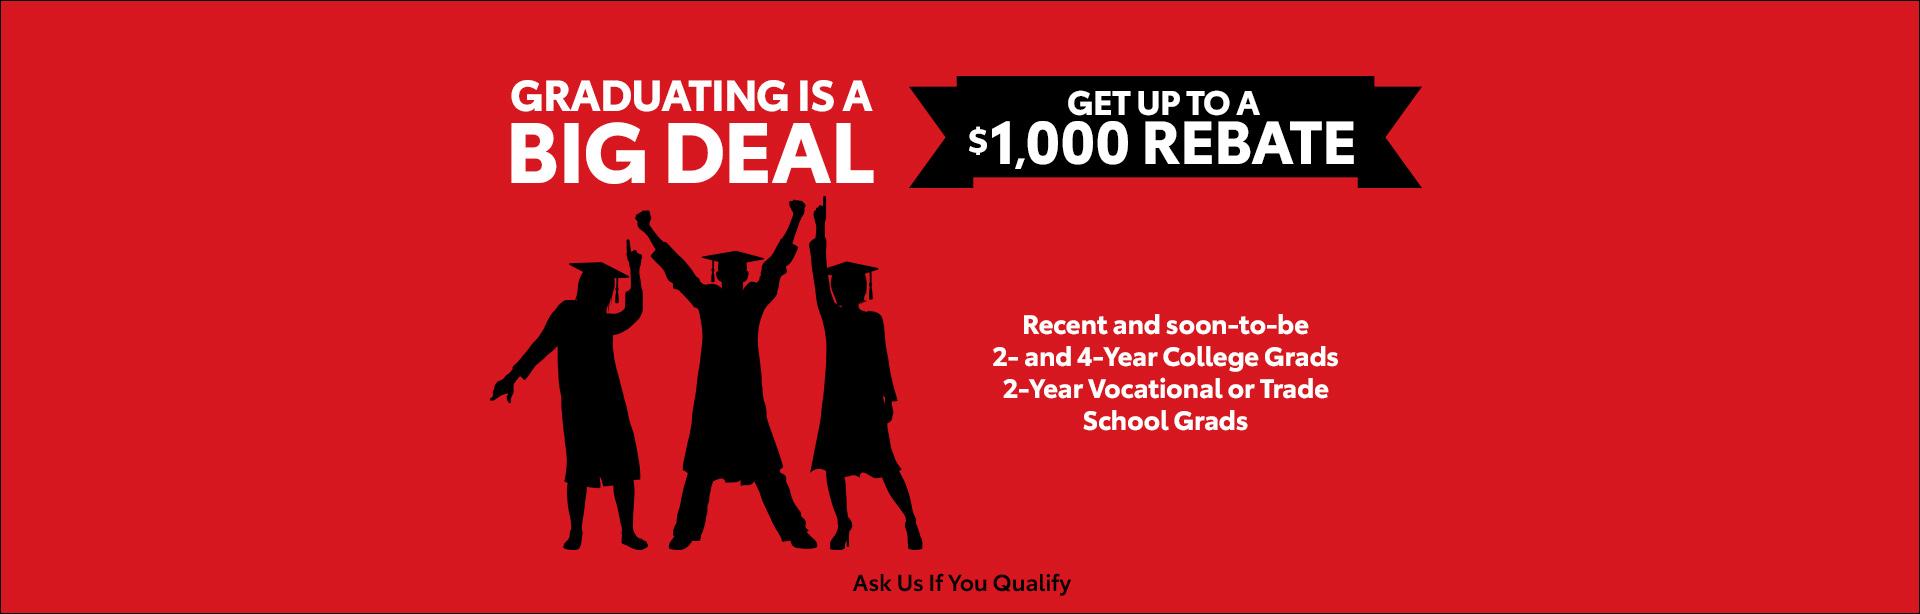 06-21_01_New-England-Toyota-Dealers-February-2021-NE---Toyota-College-Grad-Rebate-Program---June-Extend_1920x614_74c5_All-Models_R_xta.jpeg